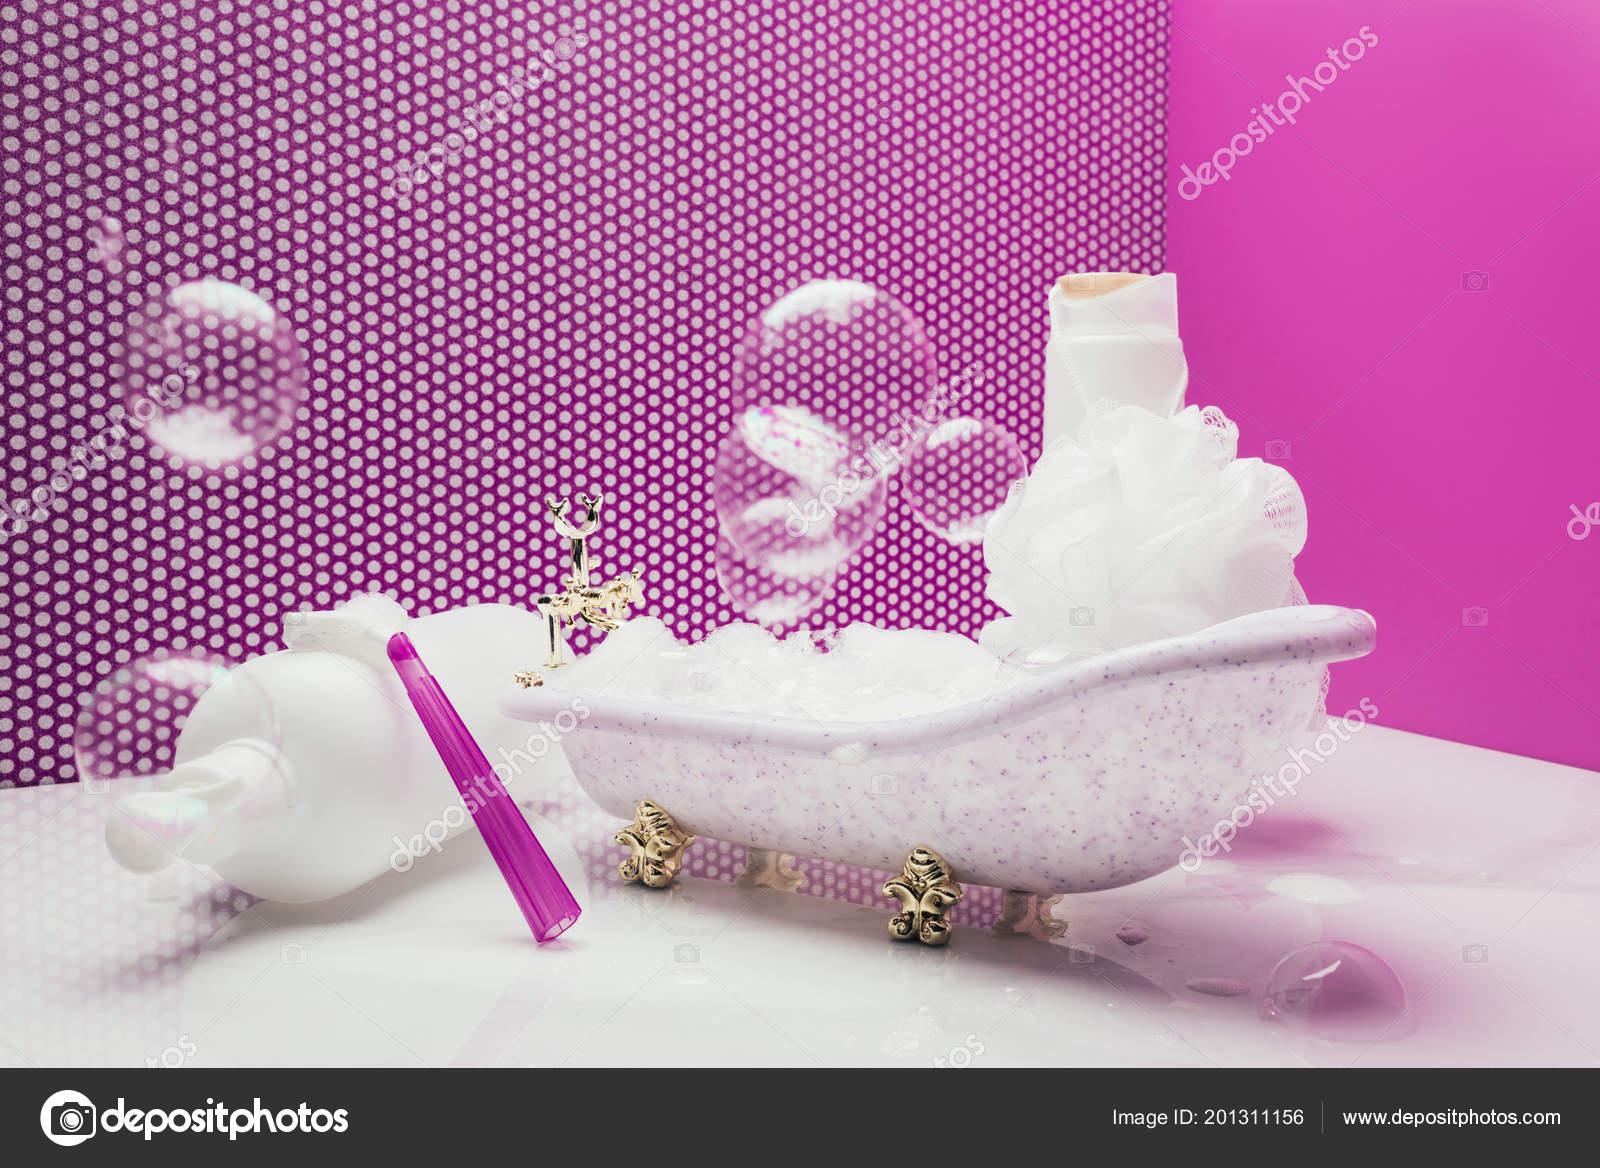 Pompas Real Con Personal Insumos Jabón Higiene Tamaño Baño Juguetes cARq5j34SL